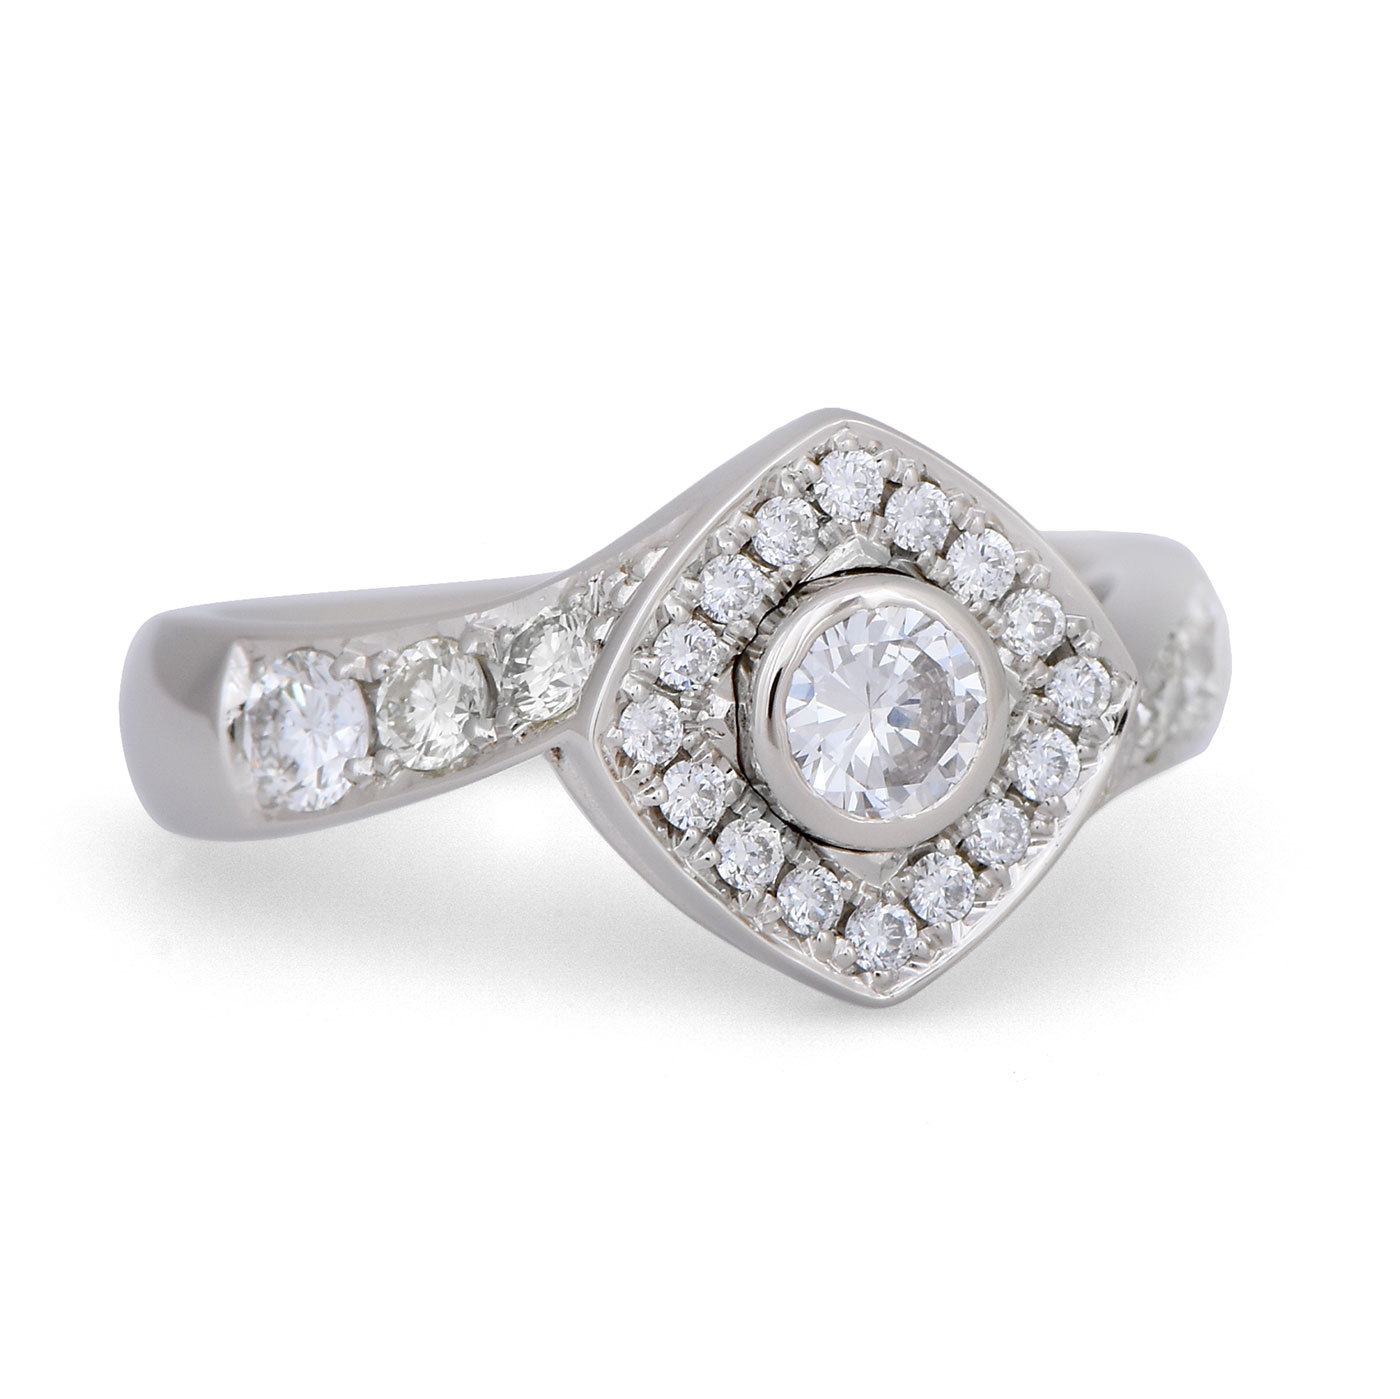 C7910 Diagonal Halo Diamond Ring